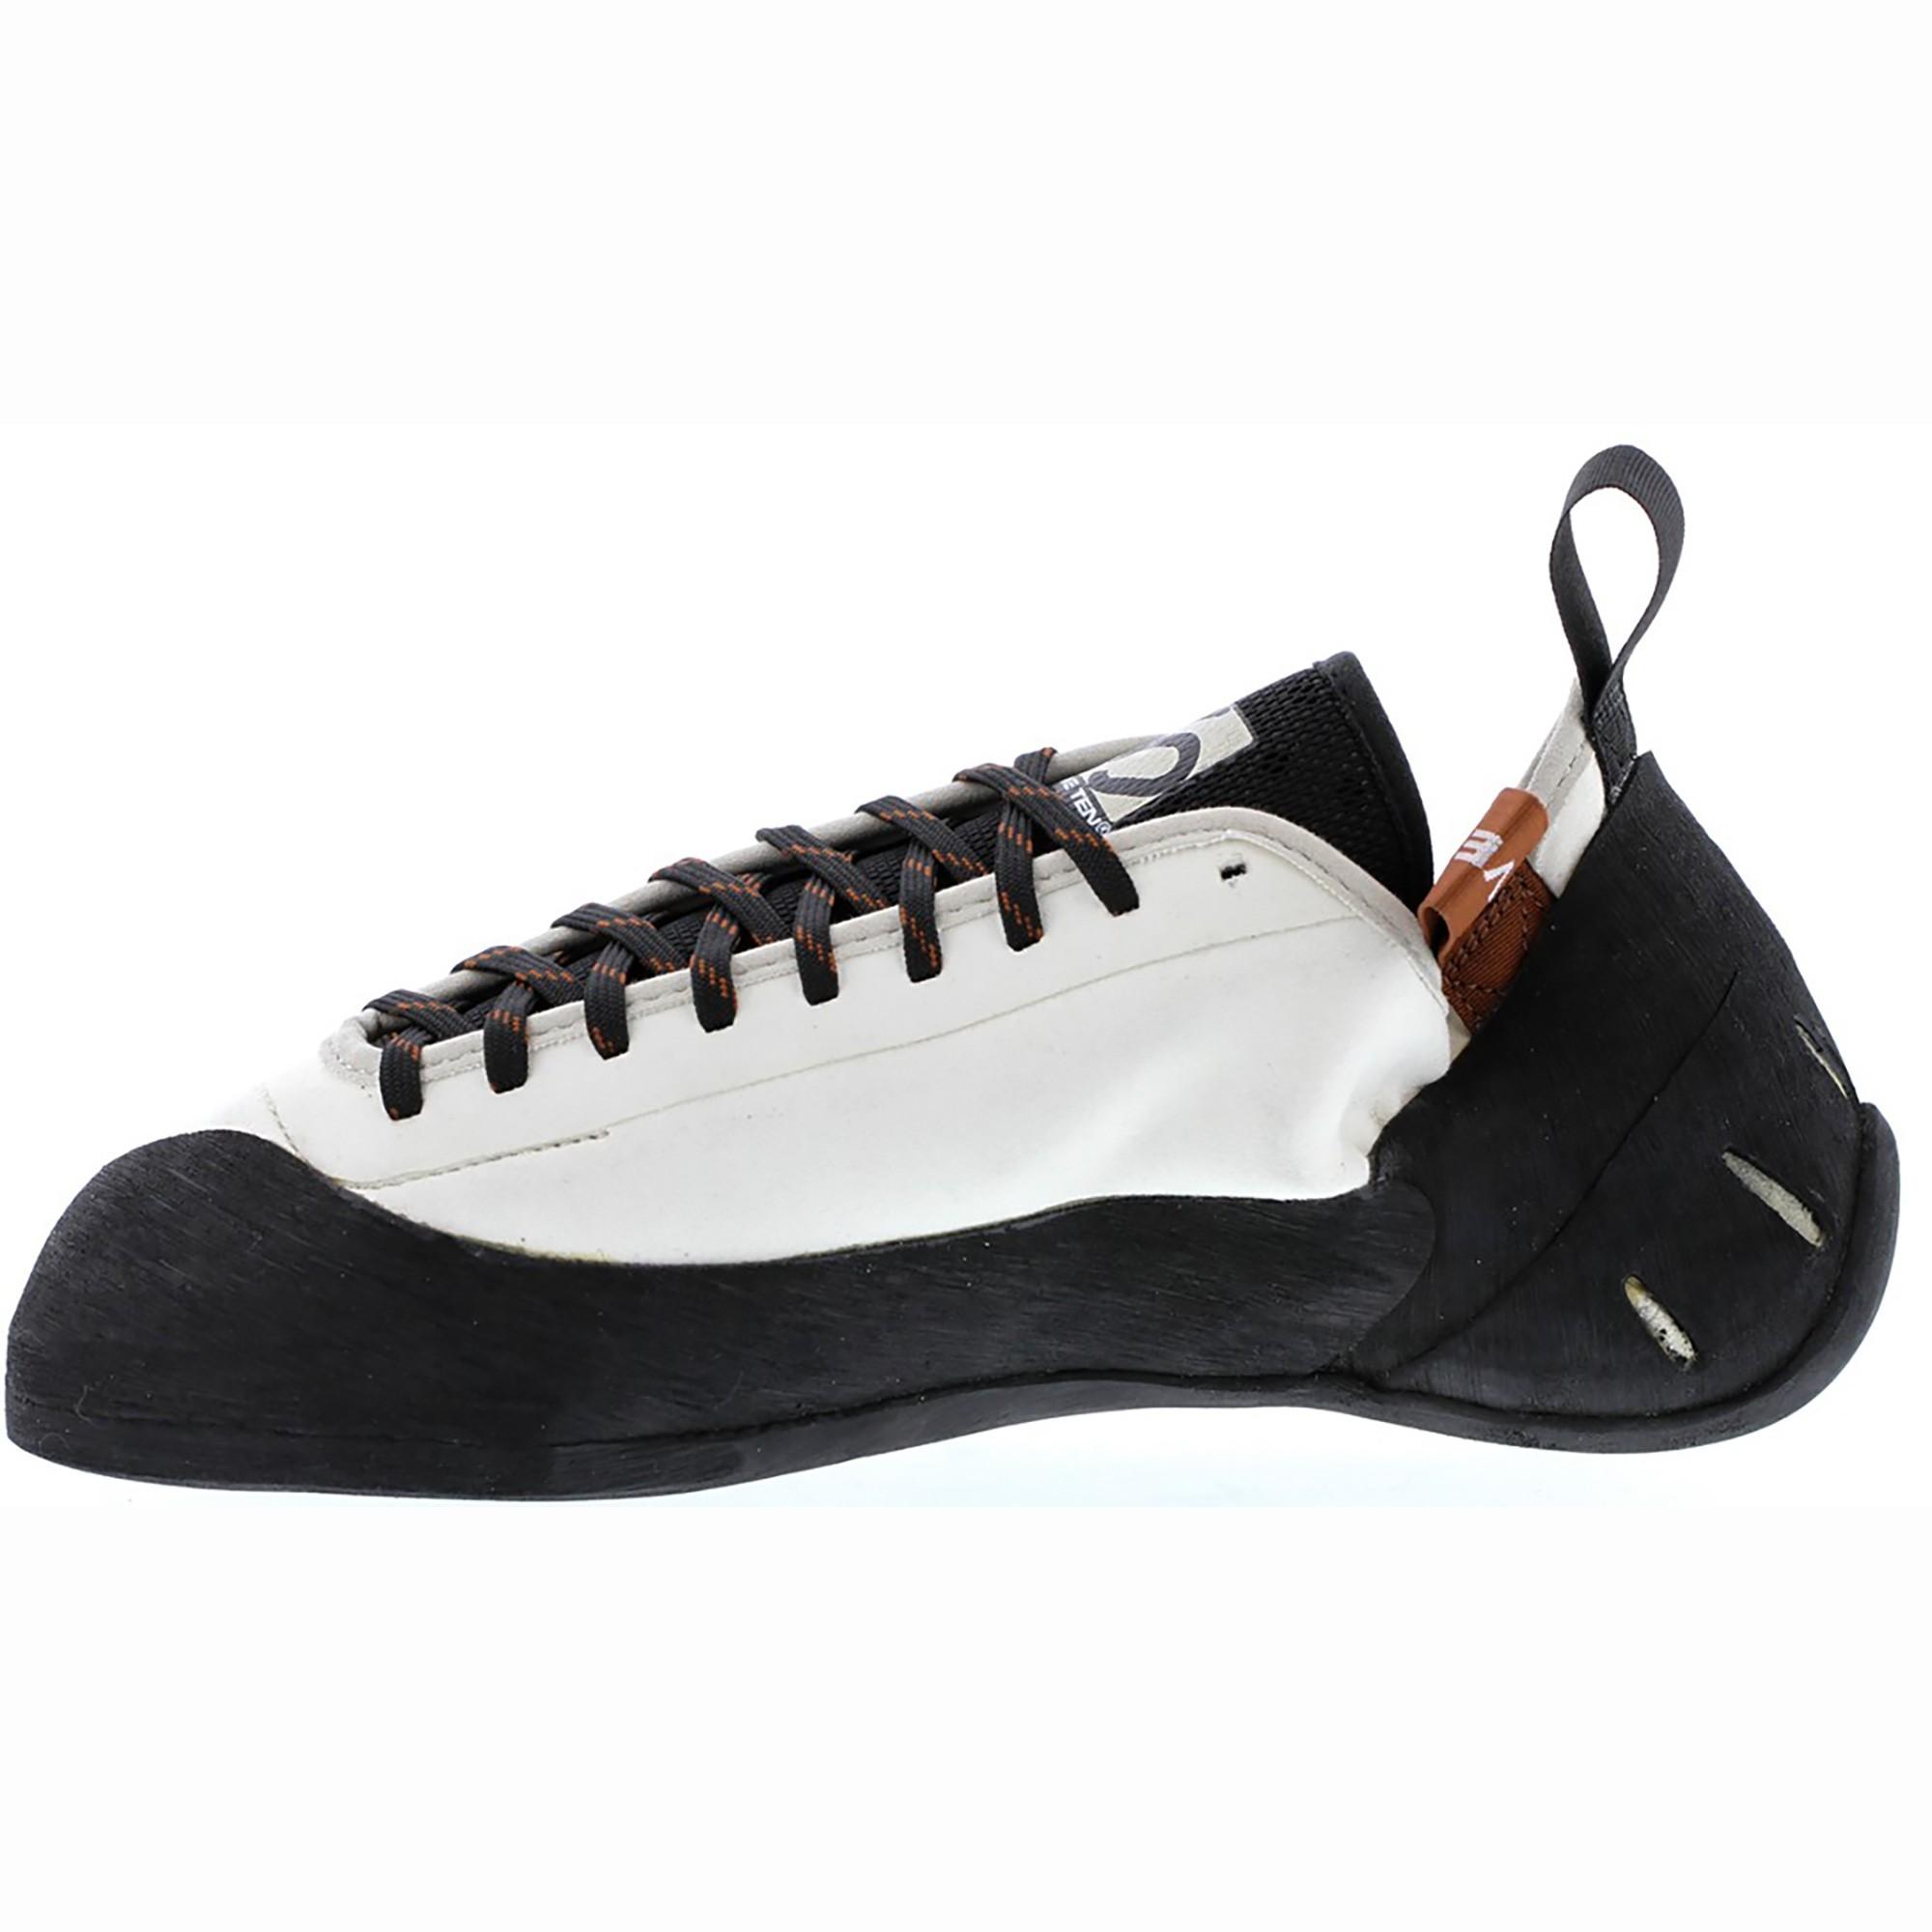 Five.Ten Anasazi Blanco Climbing Shoe - Chalk White -2